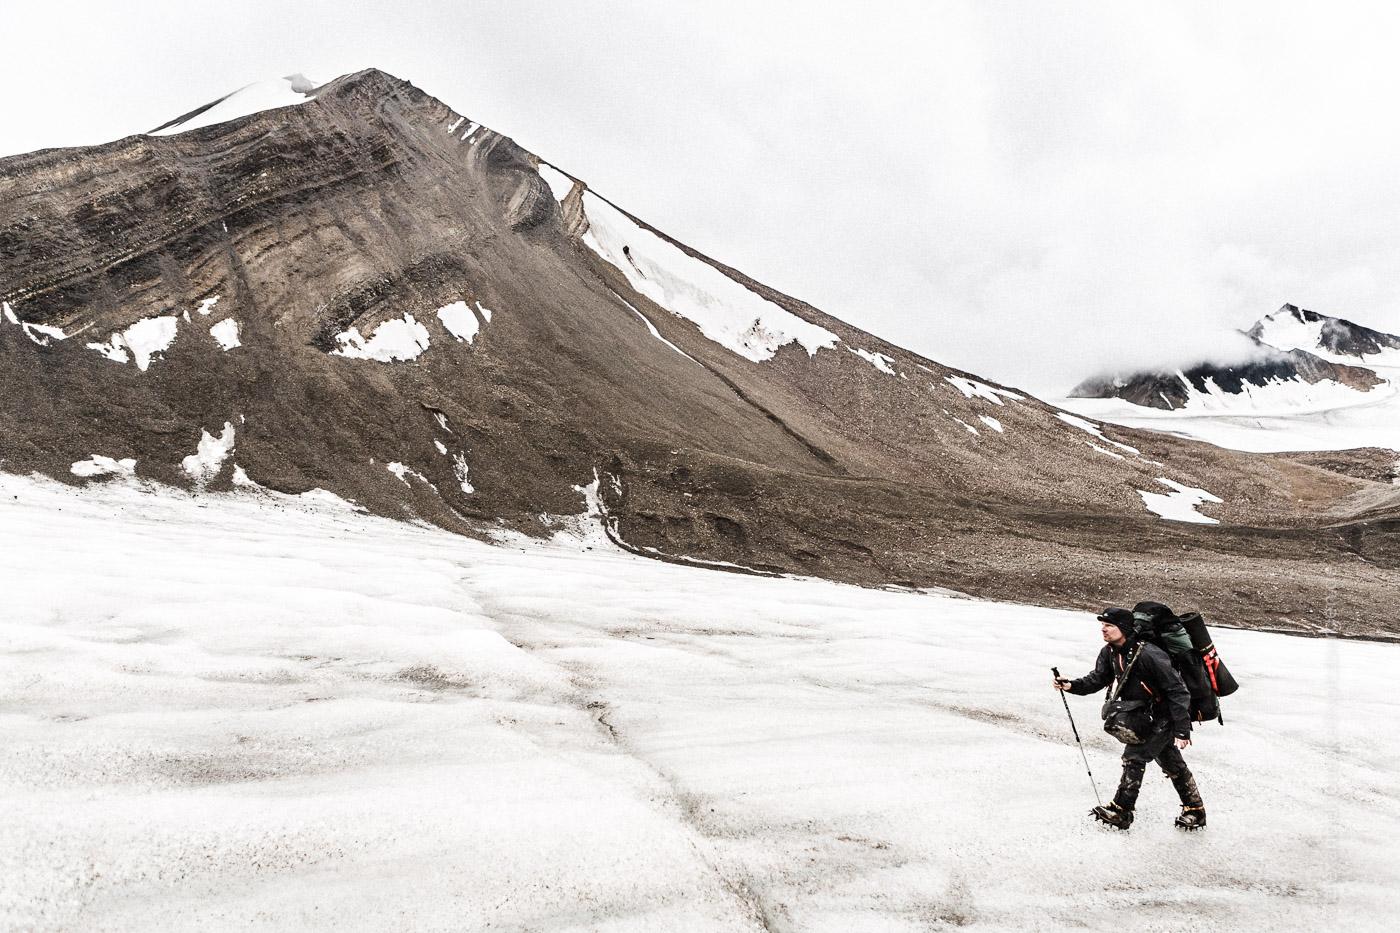 06_land_of_ice_alexanderlembke_de